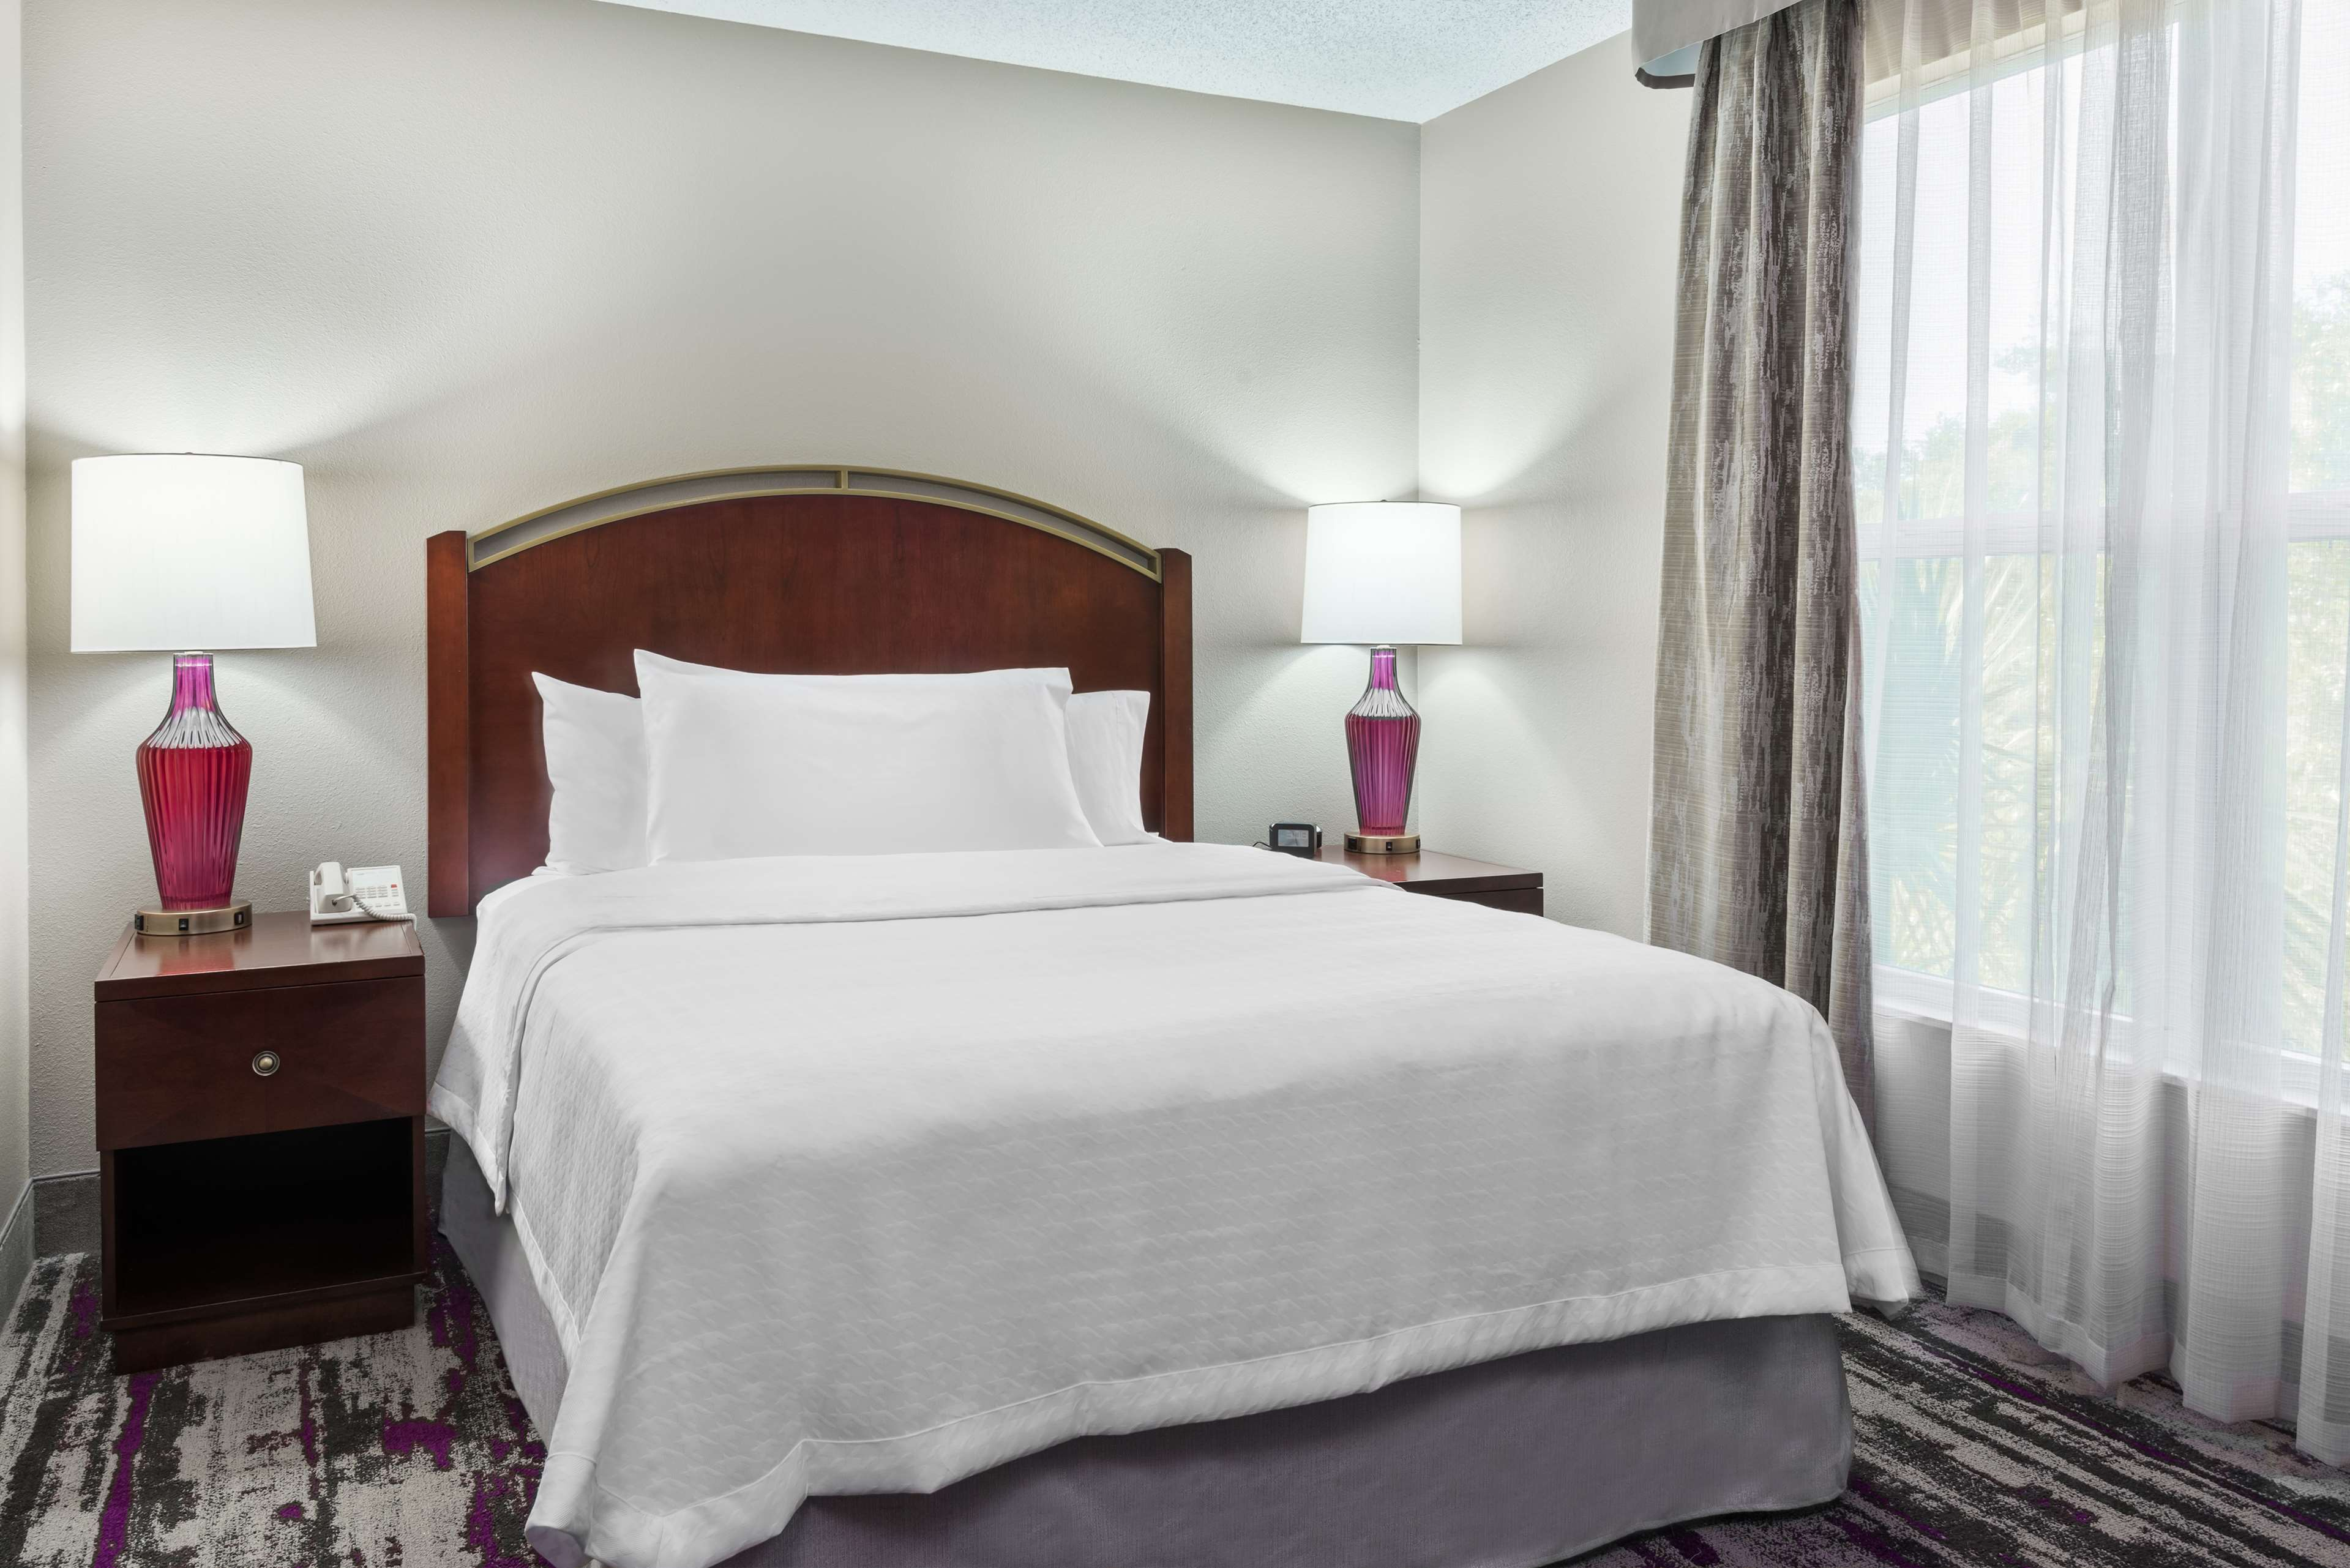 Homewood Suites by Hilton Orlando-UCF Area image 22